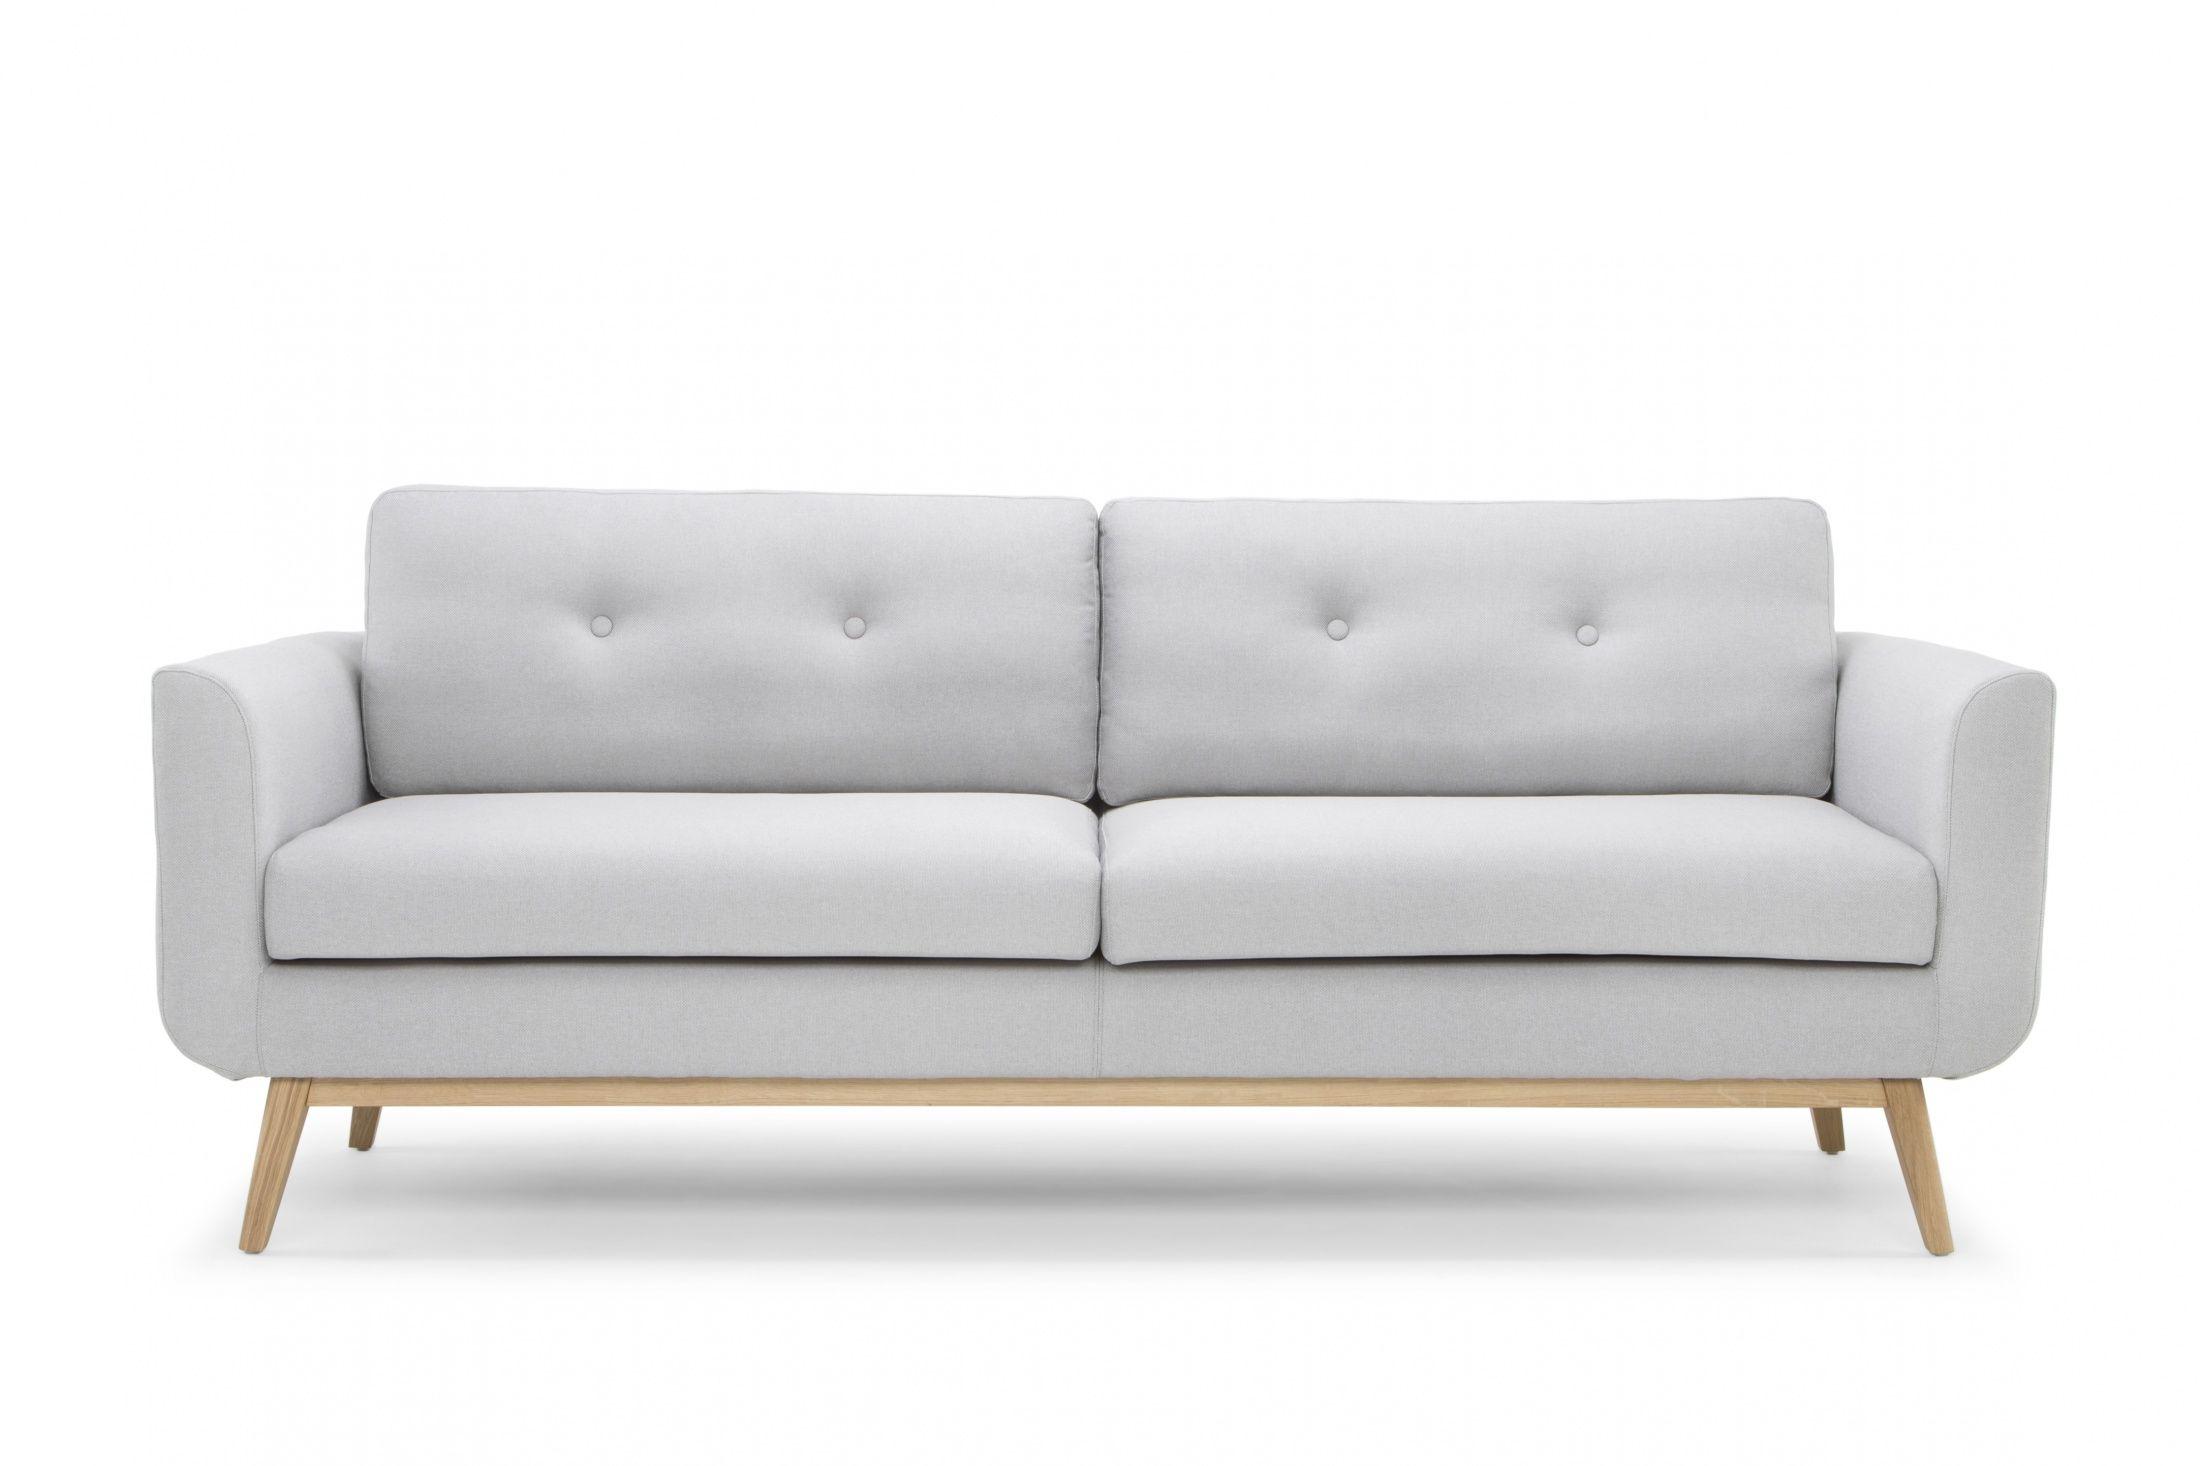 Freya Light Grey 3 Seat Sofa With Wood Legs Front View Sofa Design Light Gray Sofas Sofa